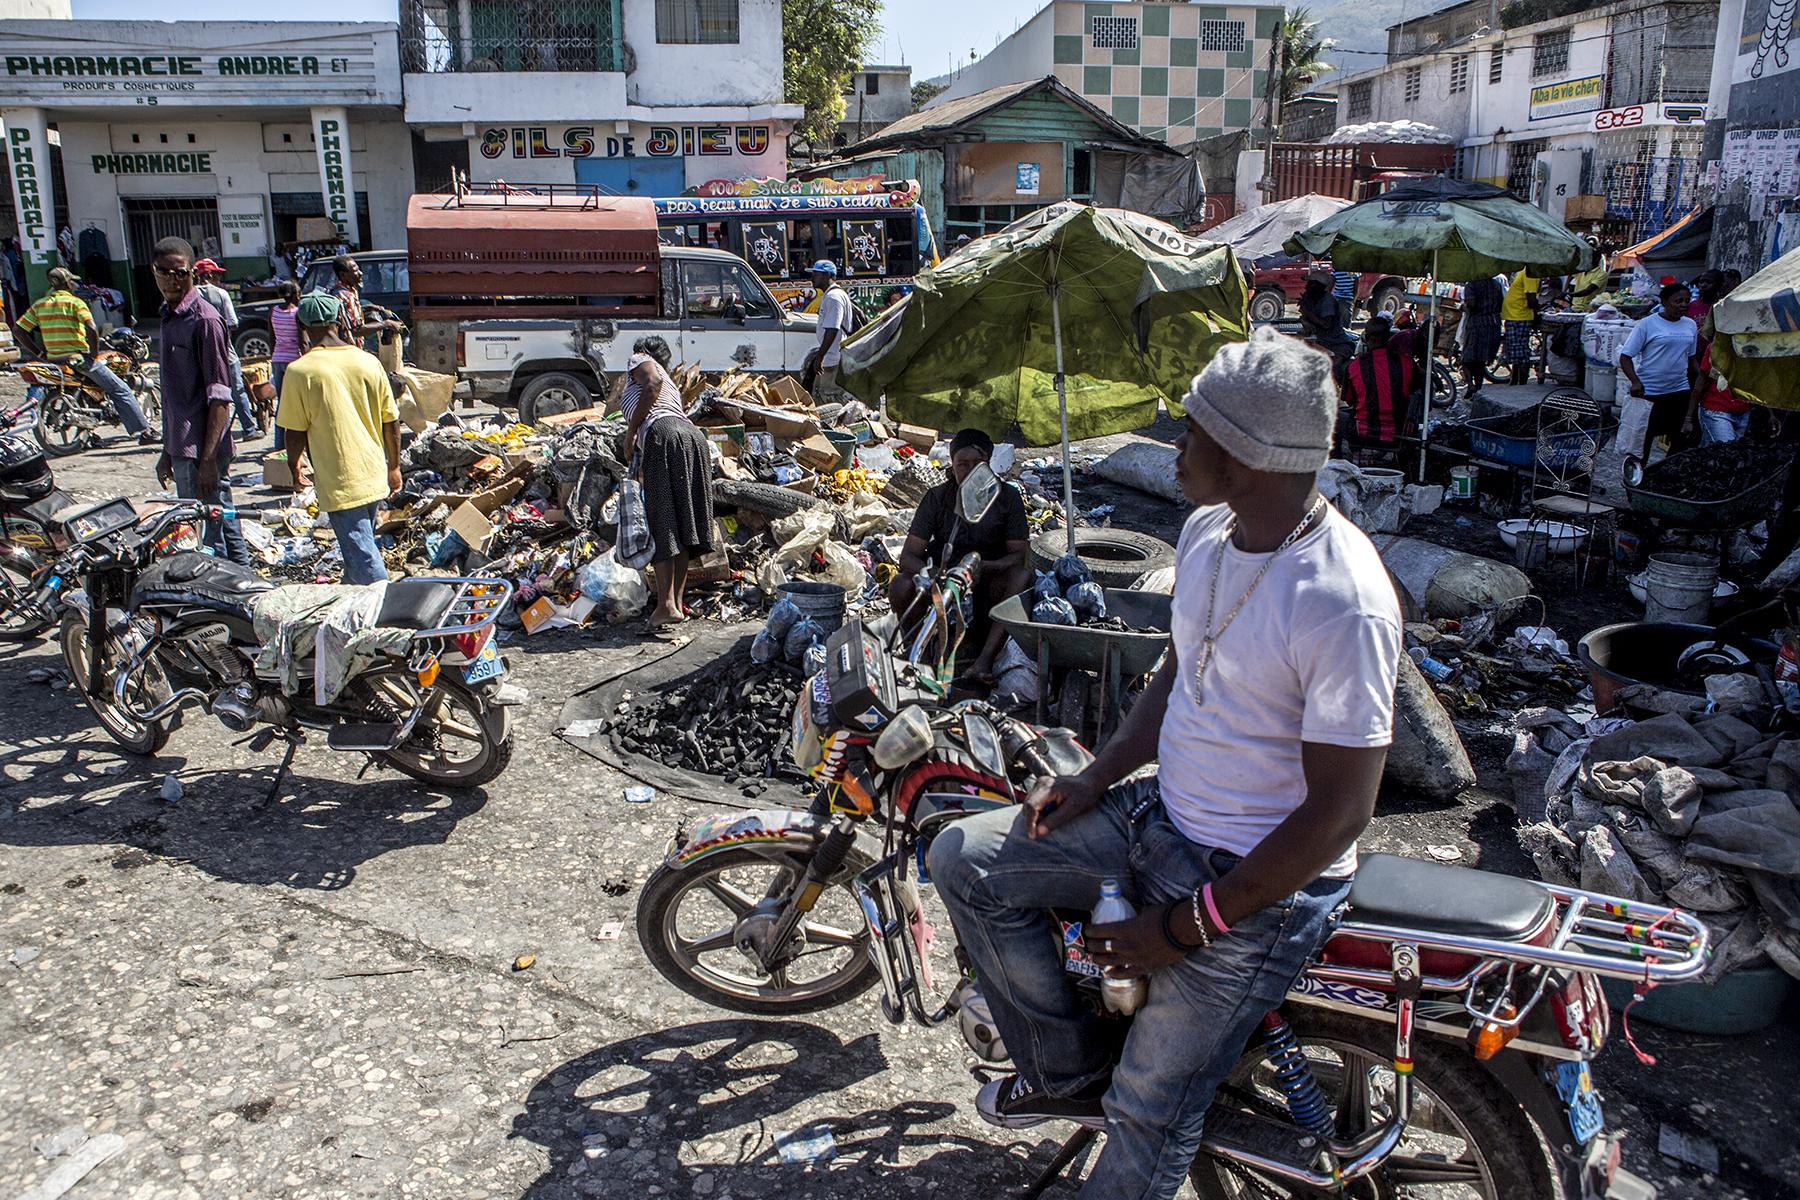 Haiti_Street_Scenes_009.JPG